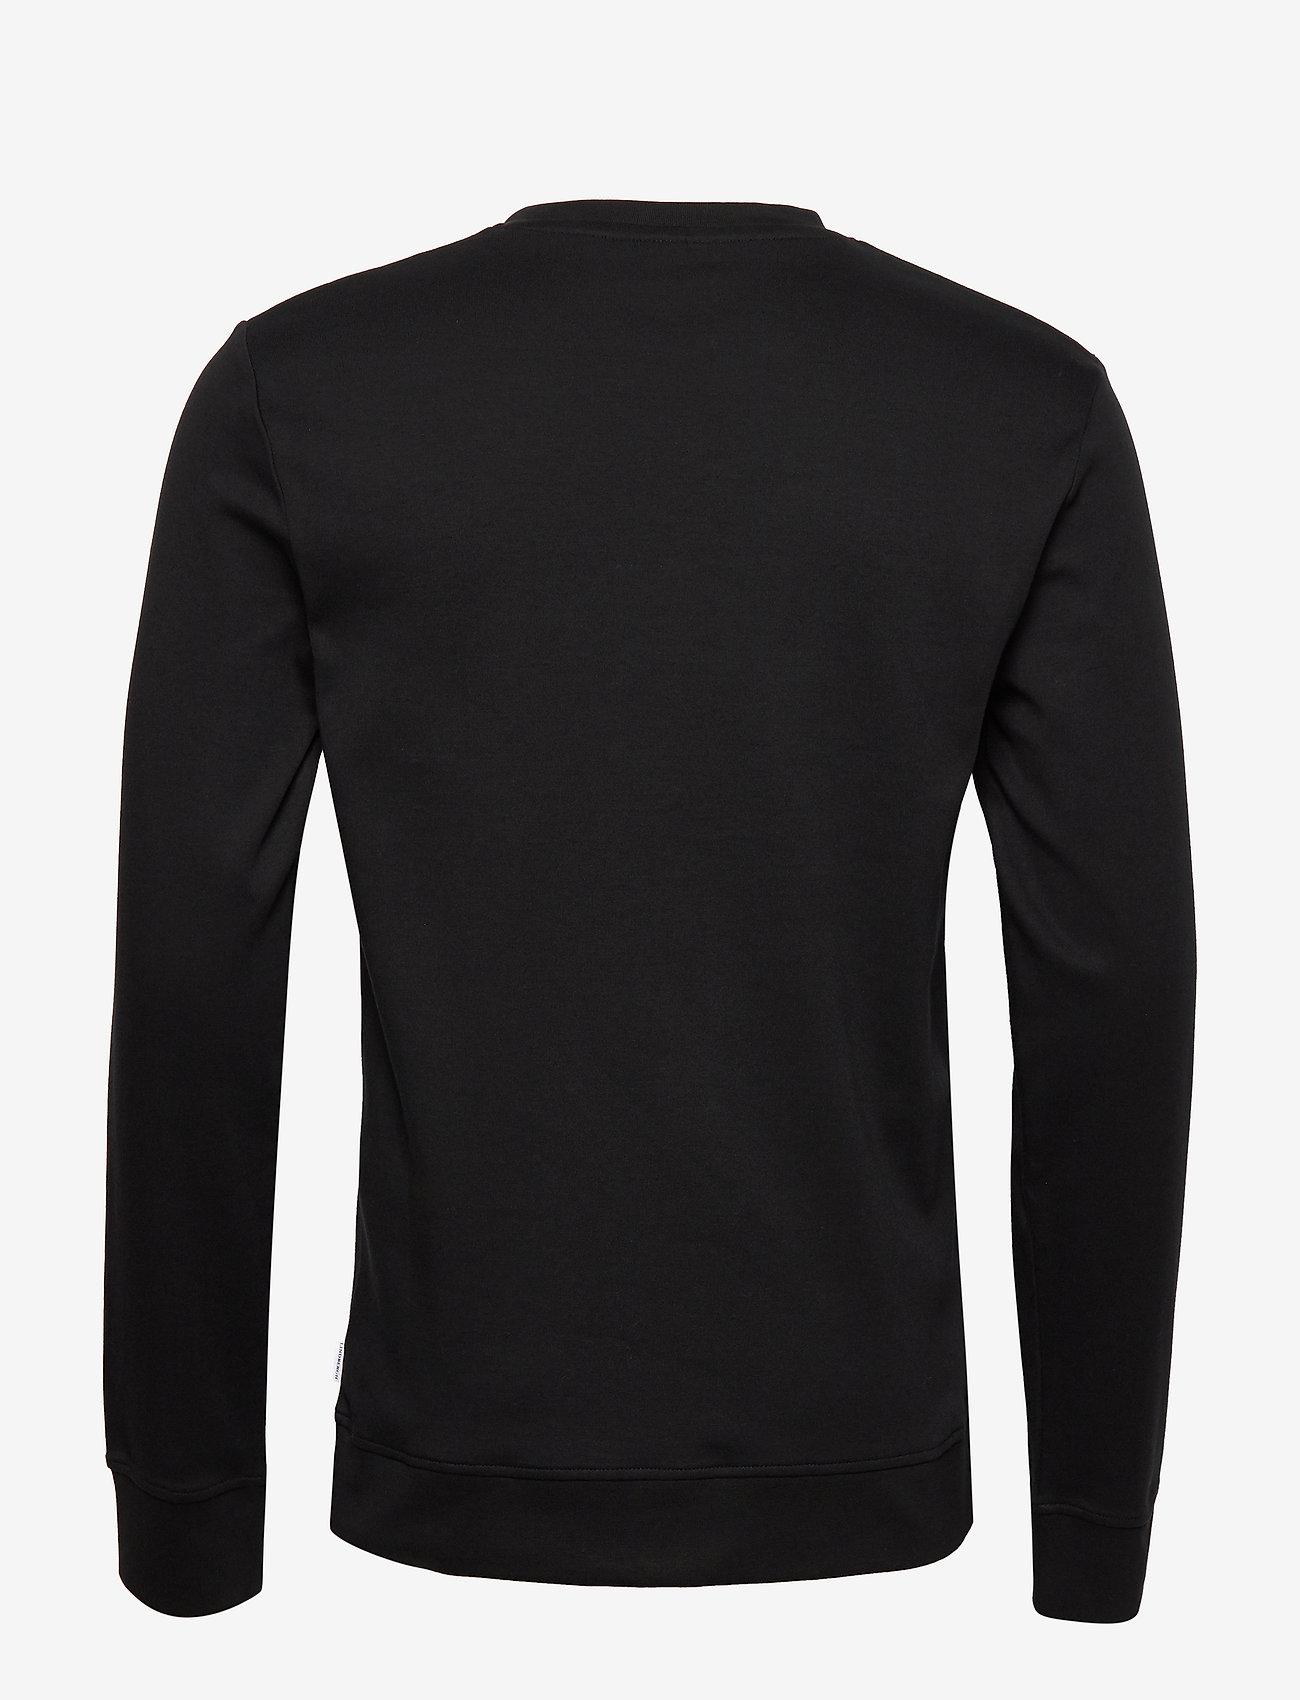 Lindbergh Logo Flock Print Sweatshirt - Sweats